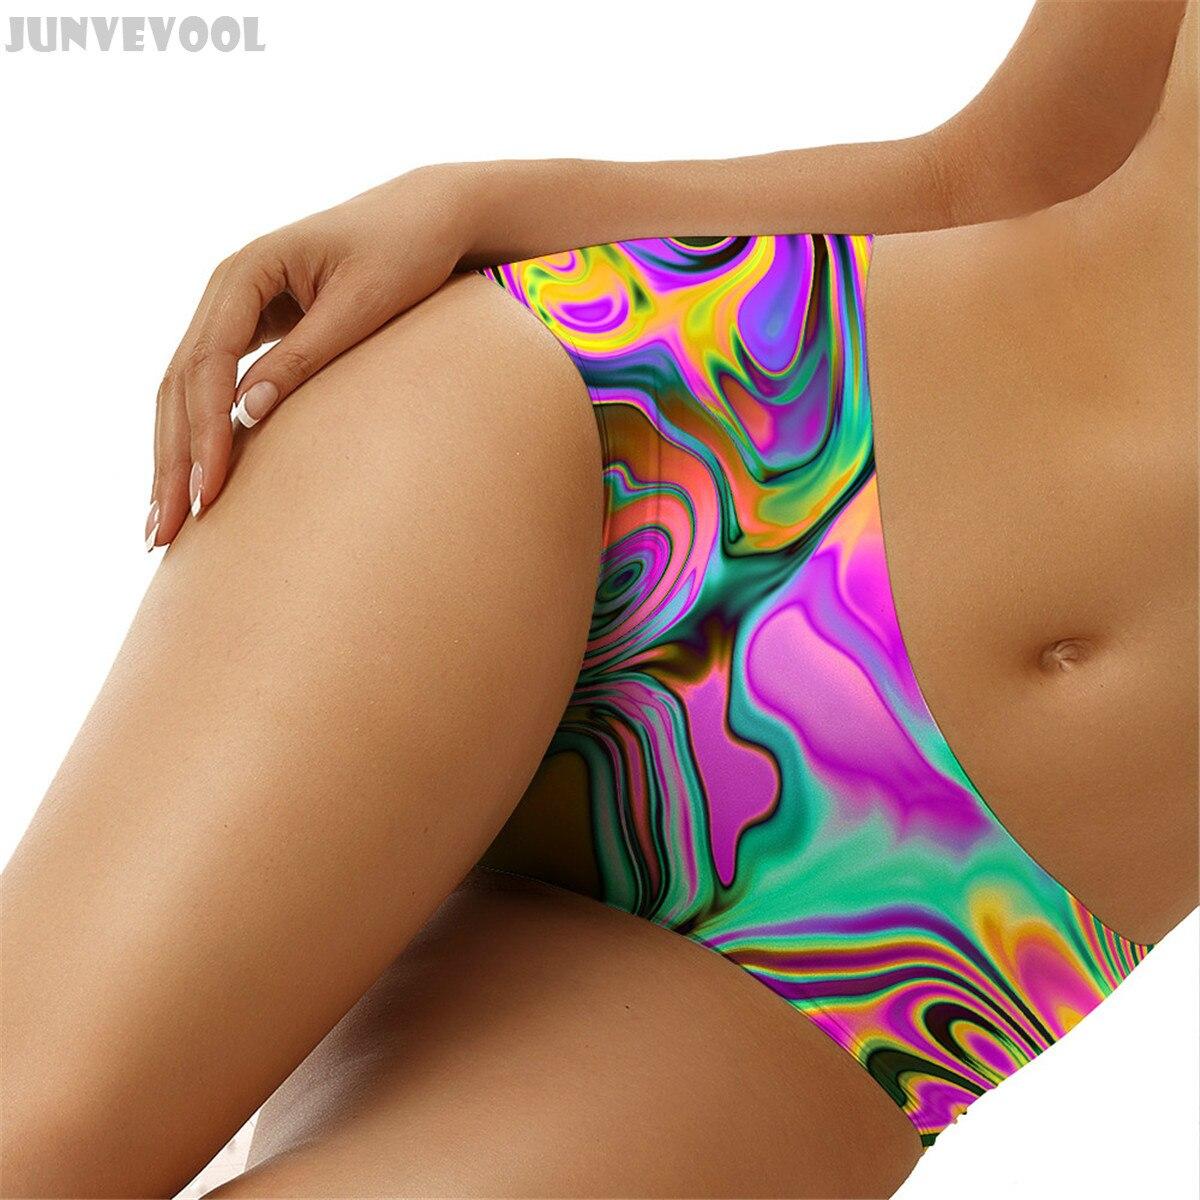 Buy Underwear Female Geometry Intimates Lady Women's Seamless Briefs Dizziness Stripes Panties Knickers Bikini Lingerie Underpants